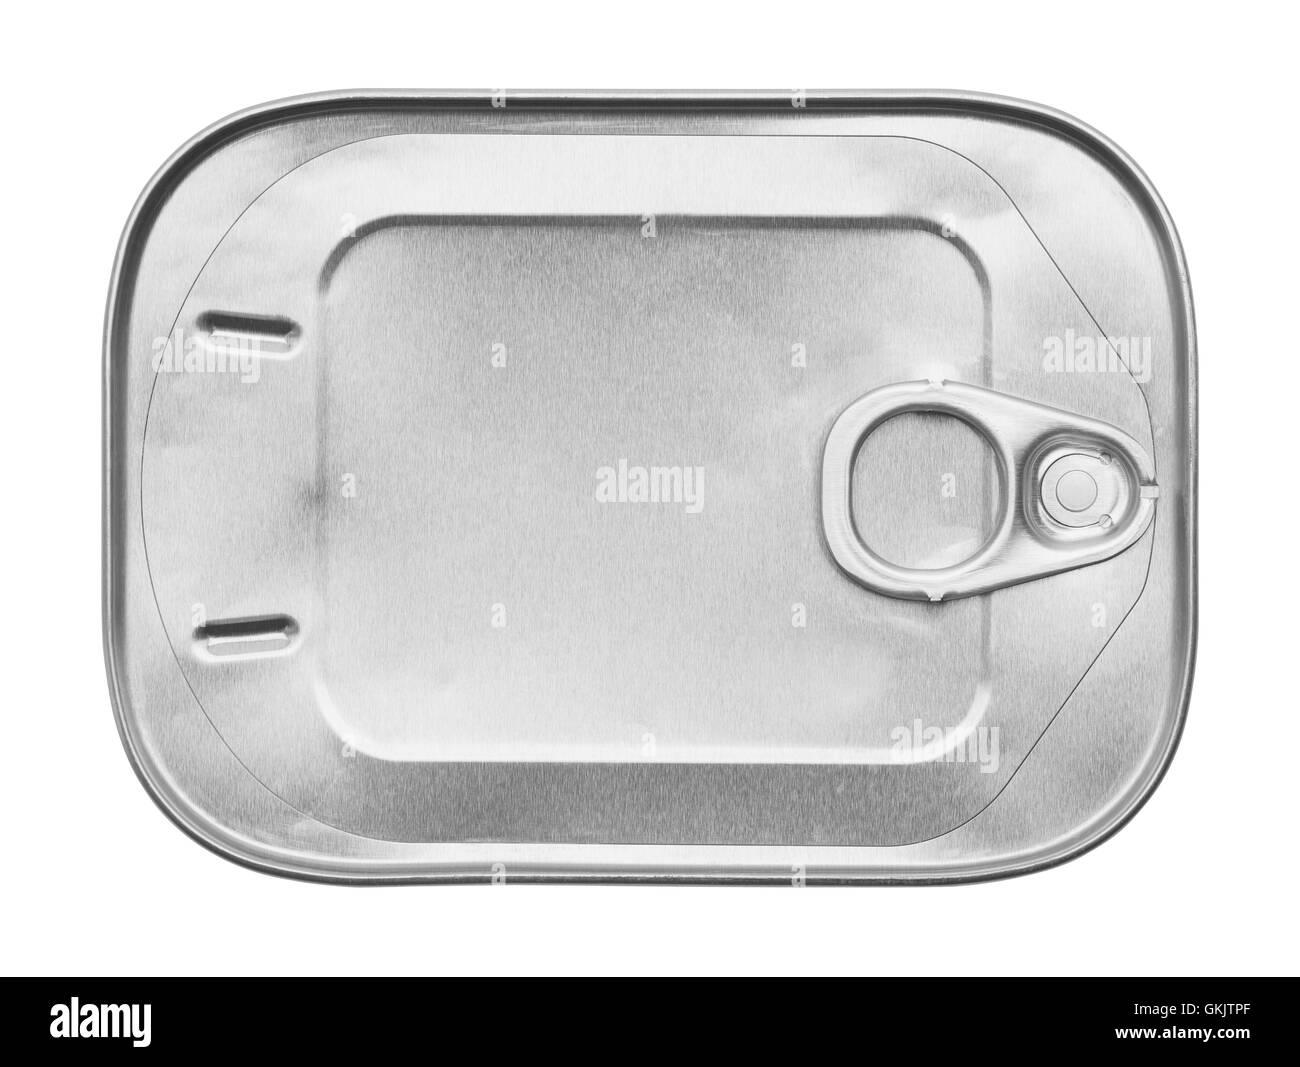 New Sardine Can Isolated on White Background. - Stock Image